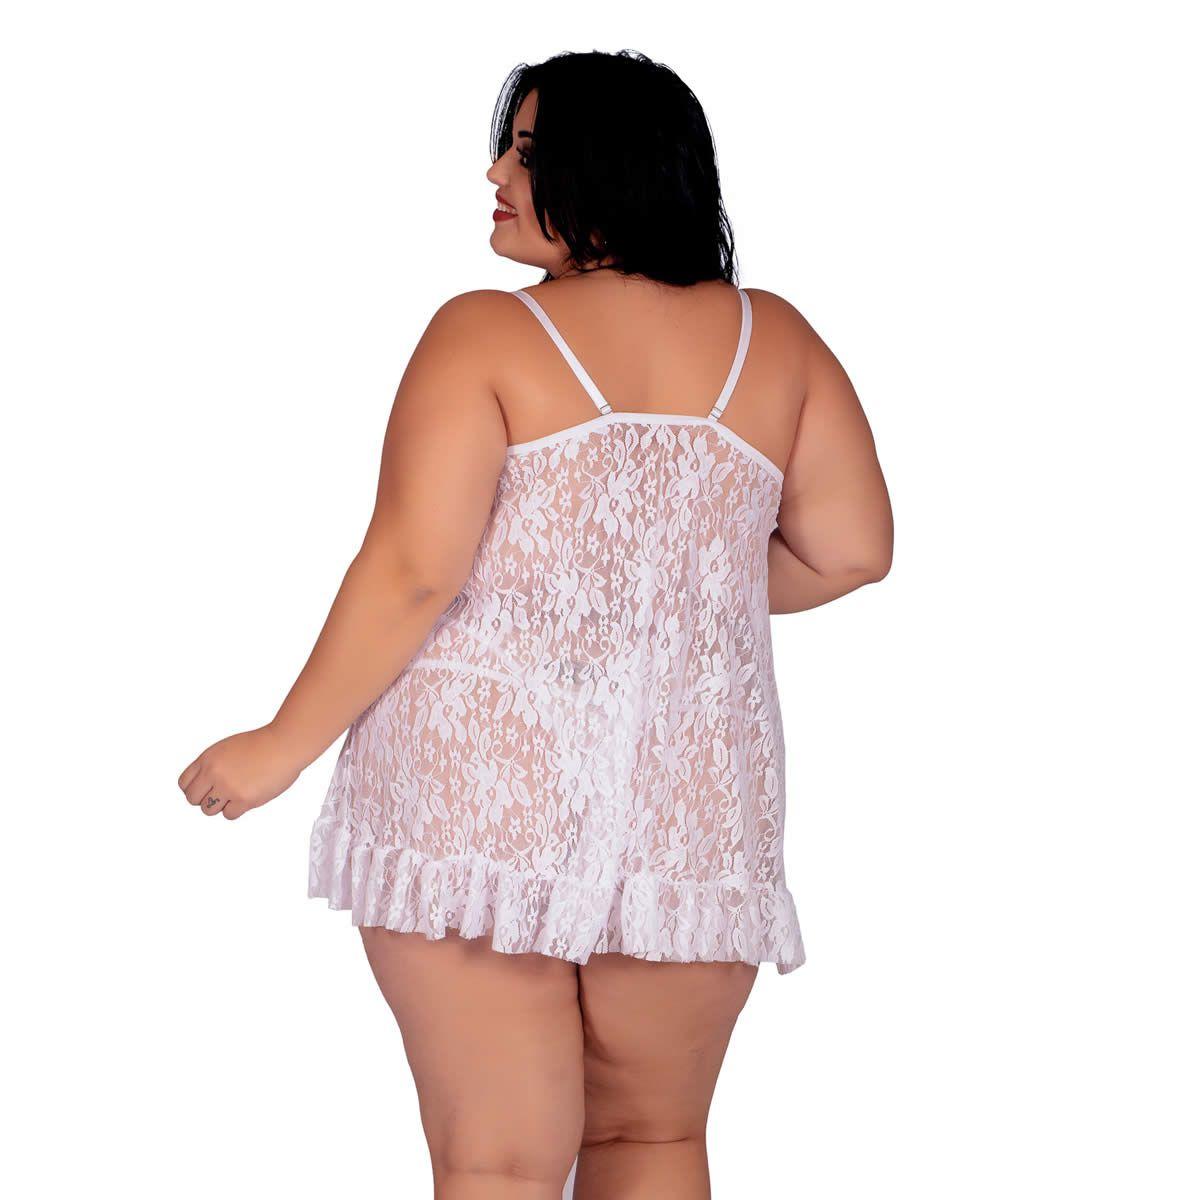 Camisola Plus Size Branca em Renda Transparente Naty - EK5026